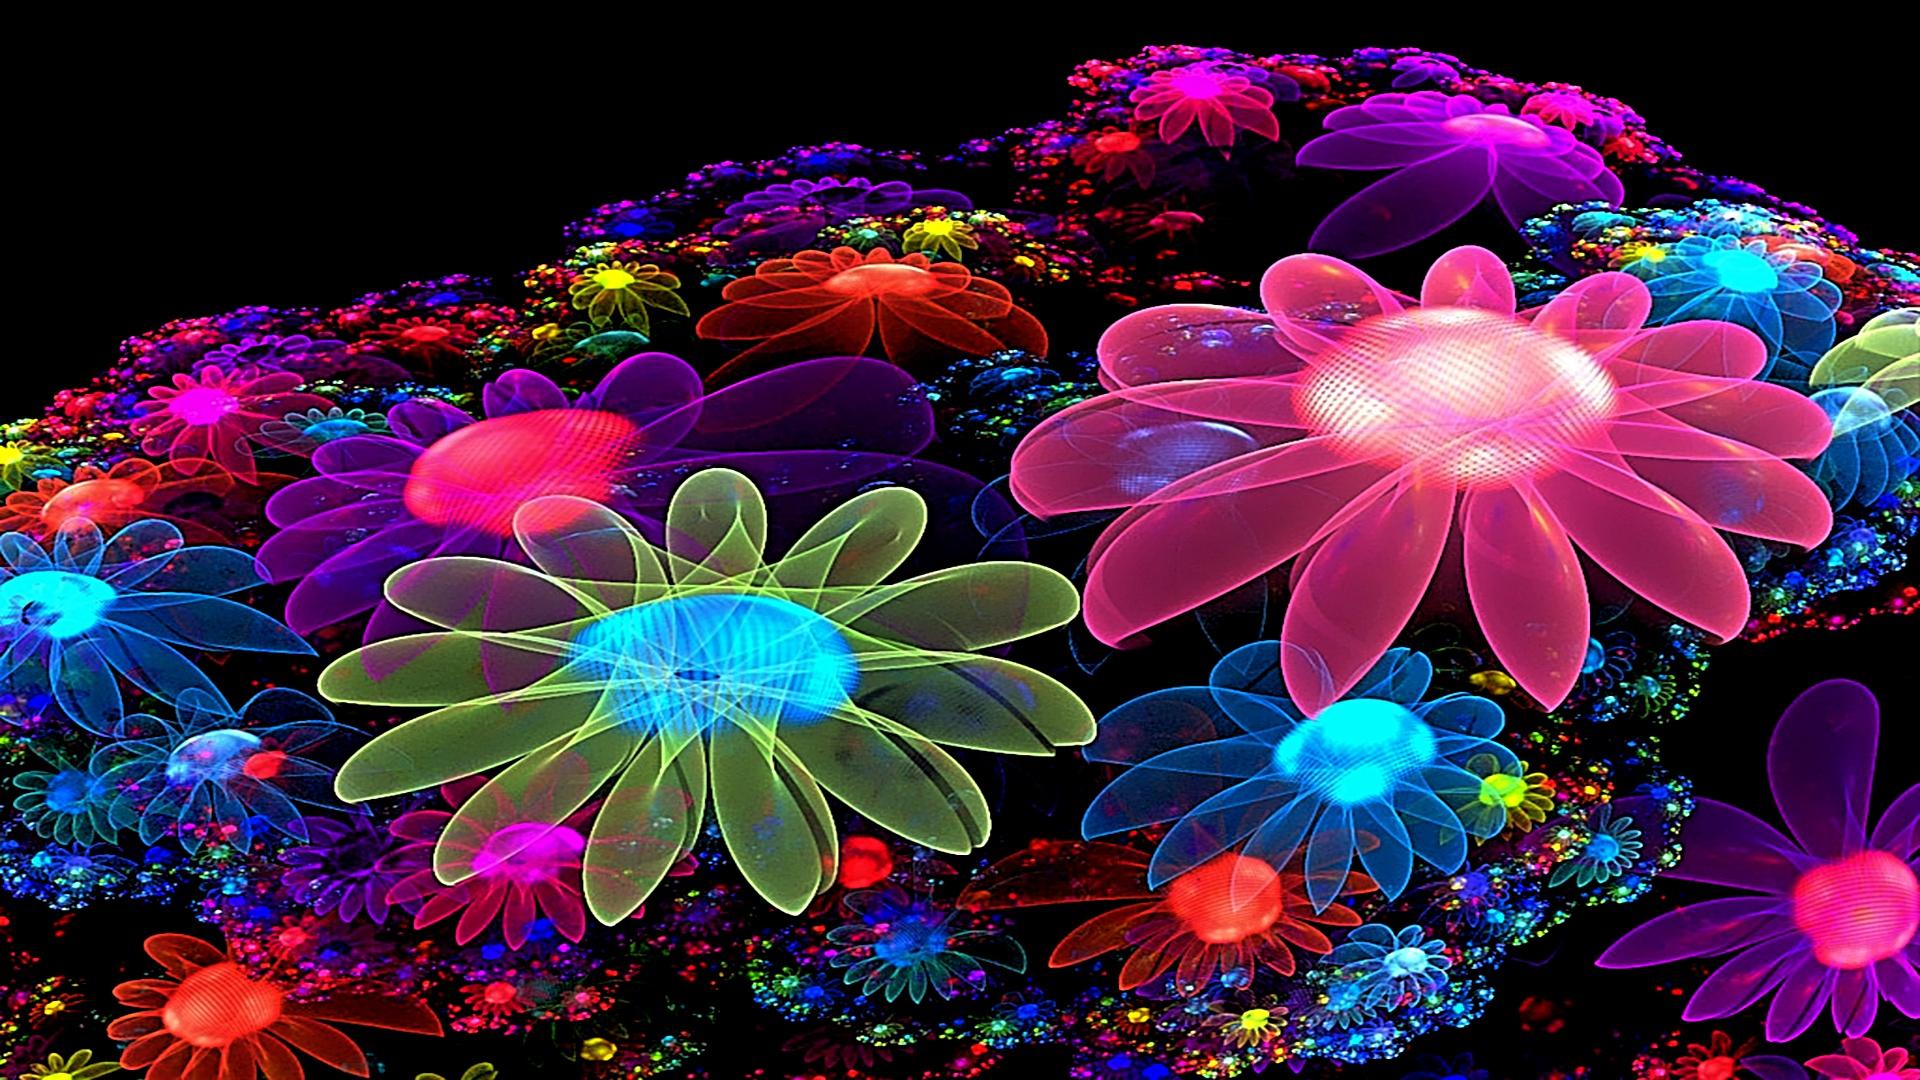 Colorful Flowers Desktop Wallpapers Images   Fullsize Wallpaper 1920x1080